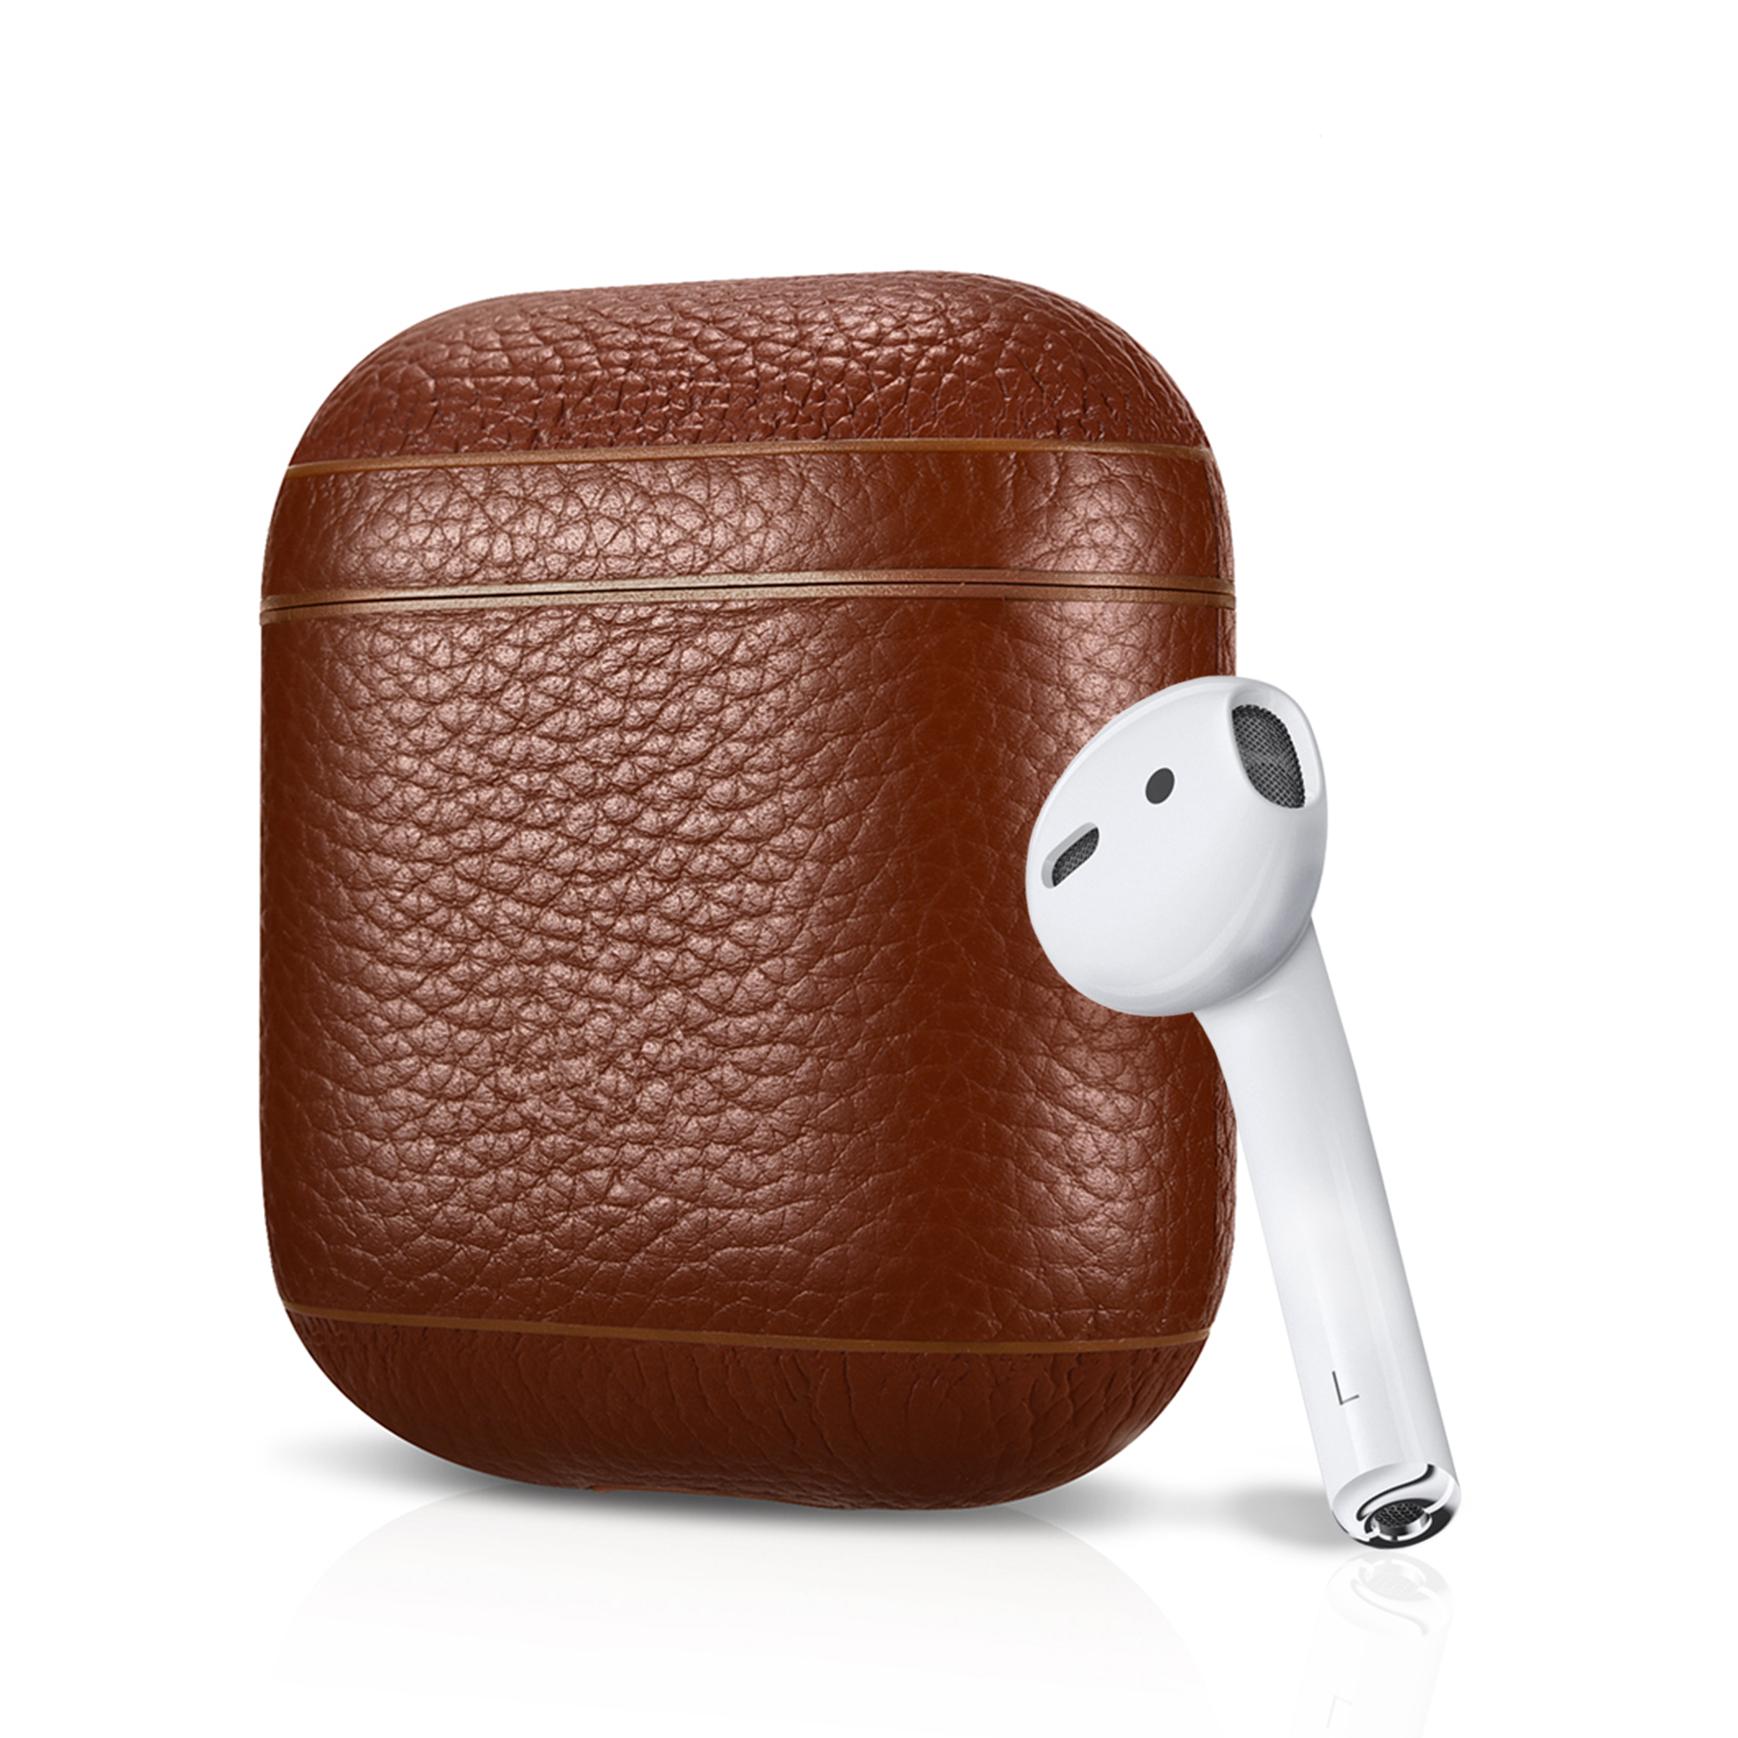 leather-airpod-case-pebble-series-air-vinyl-design